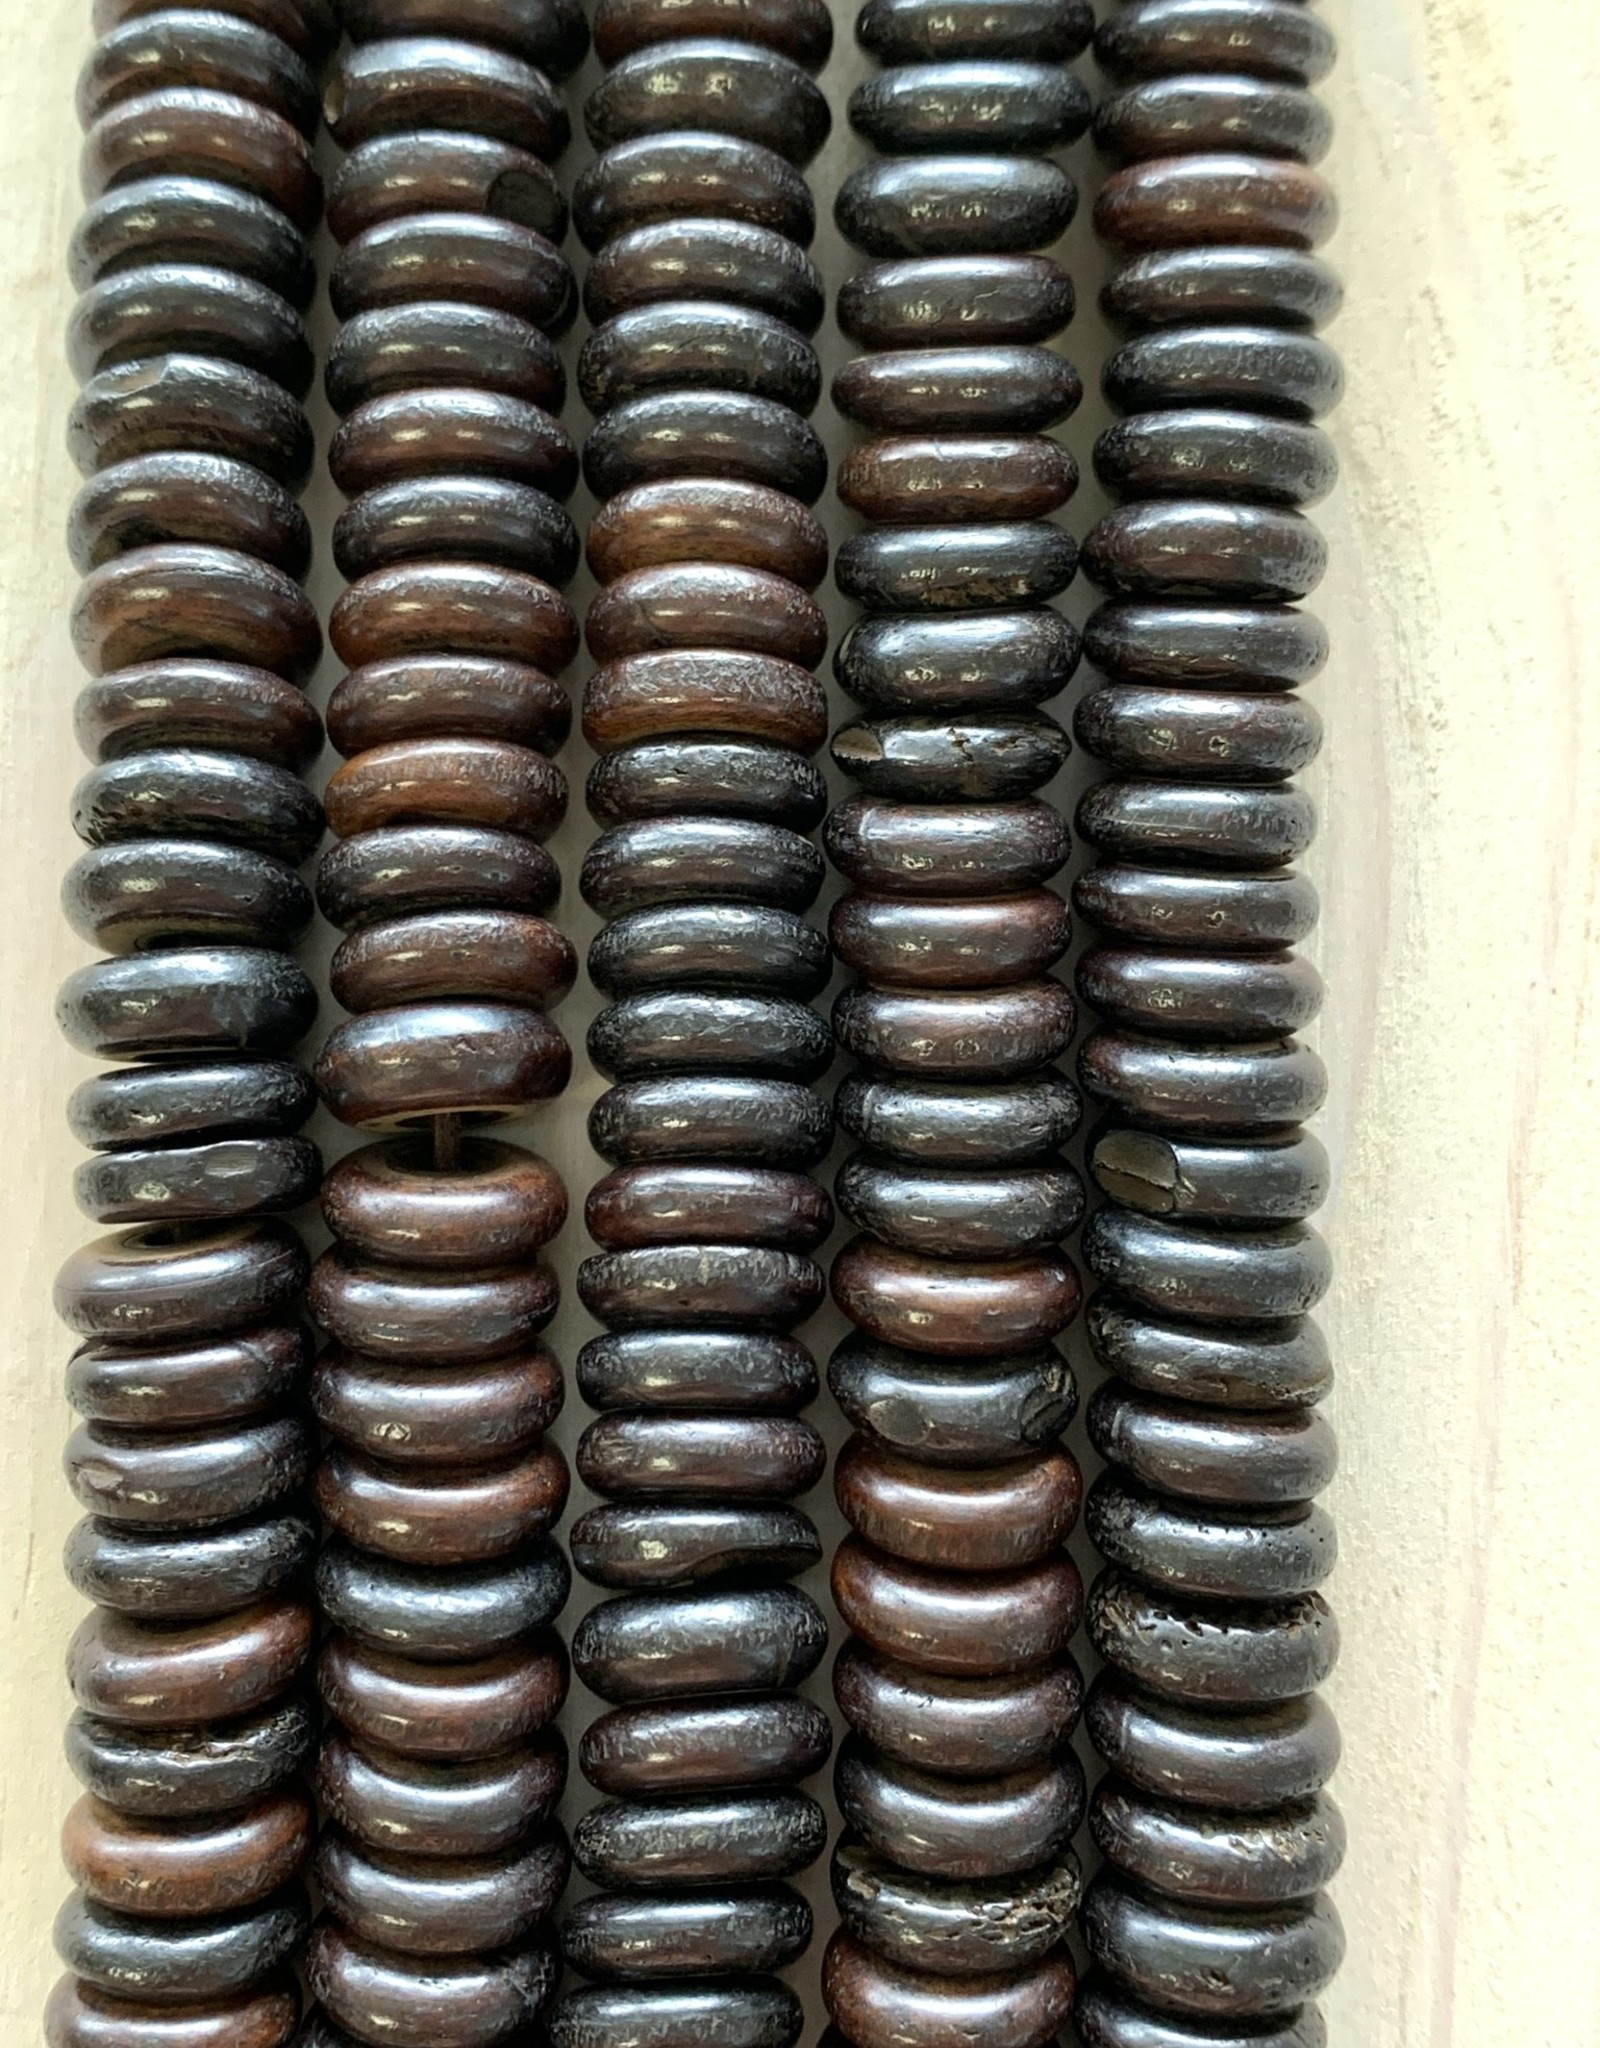 10mm Bone Saucer Dk Chocolate Large Hole Bead Strands